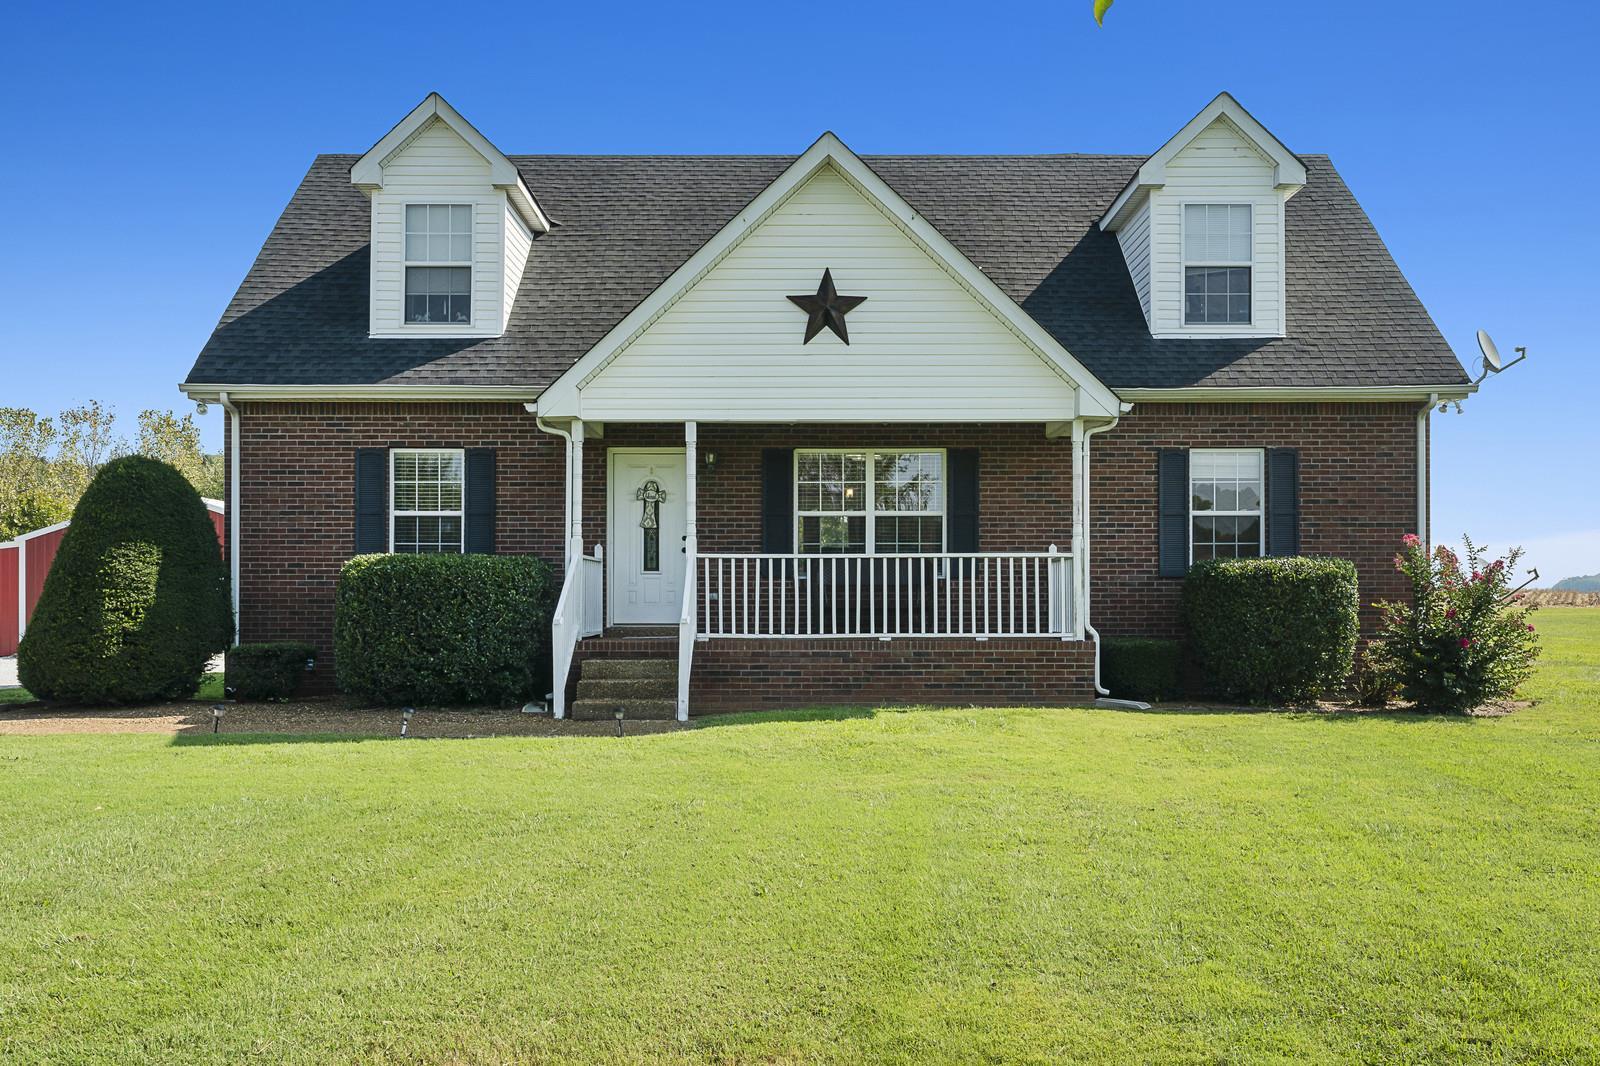 6080 S Lamont Rd, Springfield, TN 37172 - Springfield, TN real estate listing